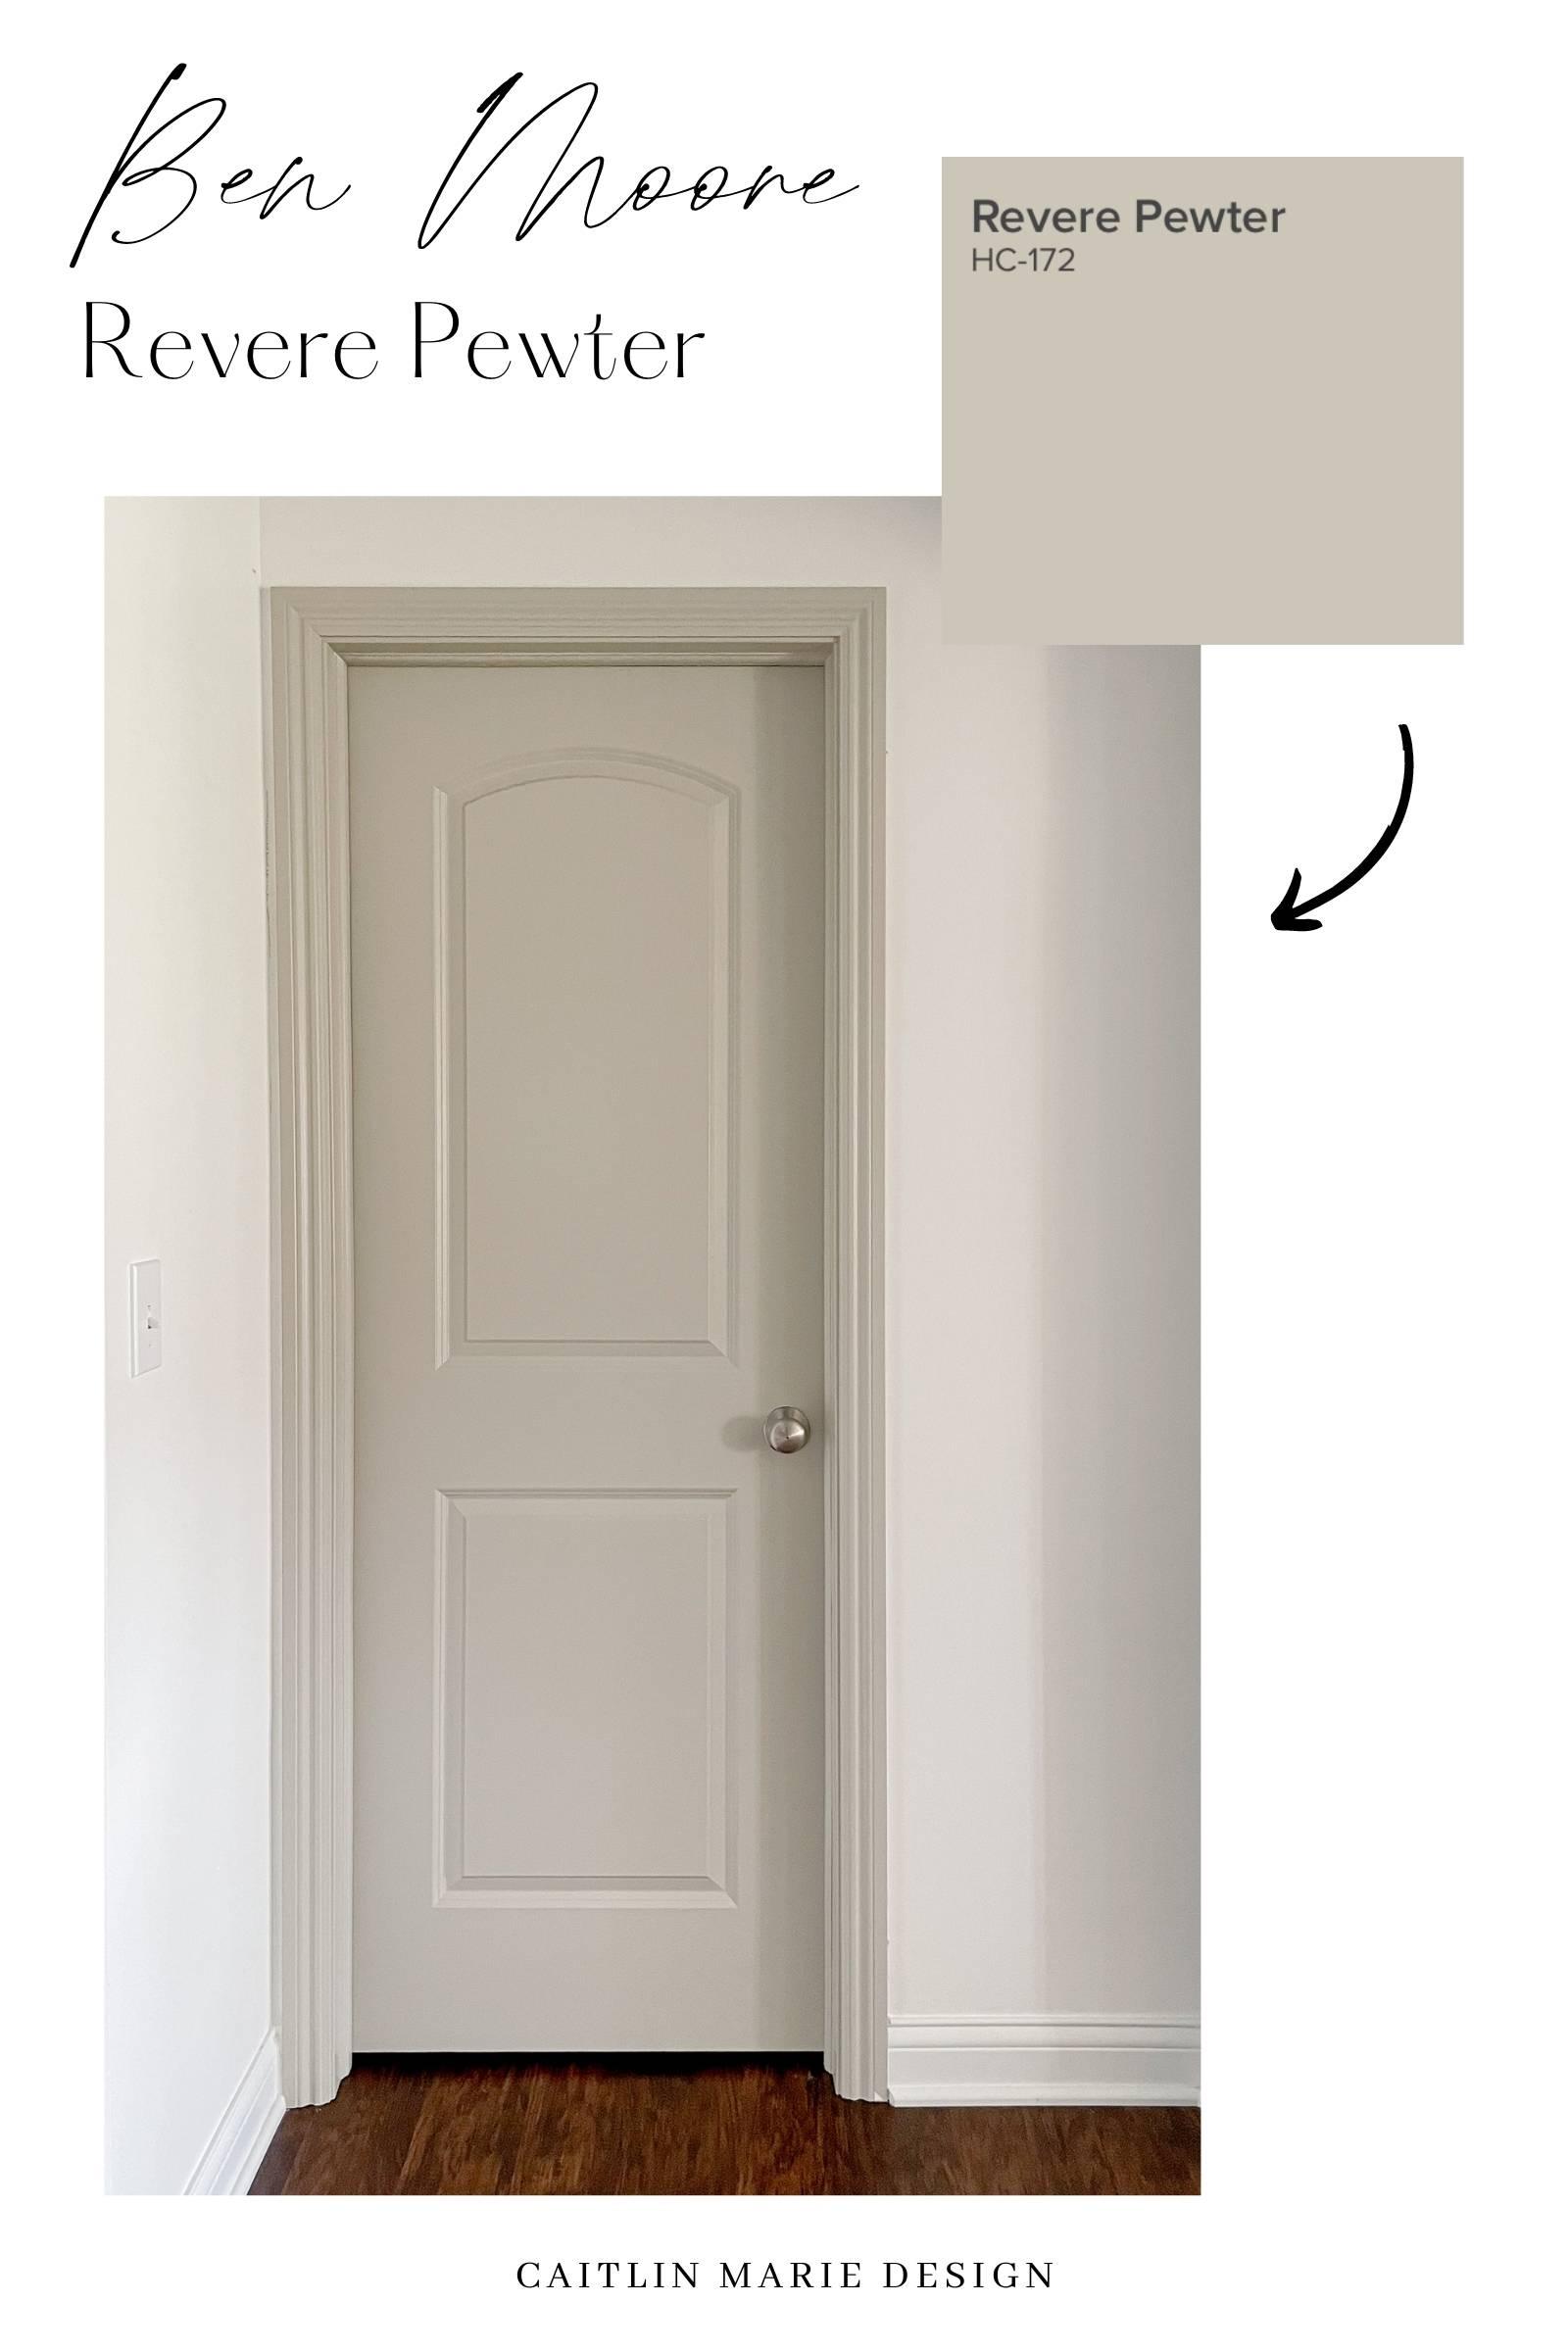 Benjamin Moore Revere Pewter greige gray beige paint color, how to paint interior doors